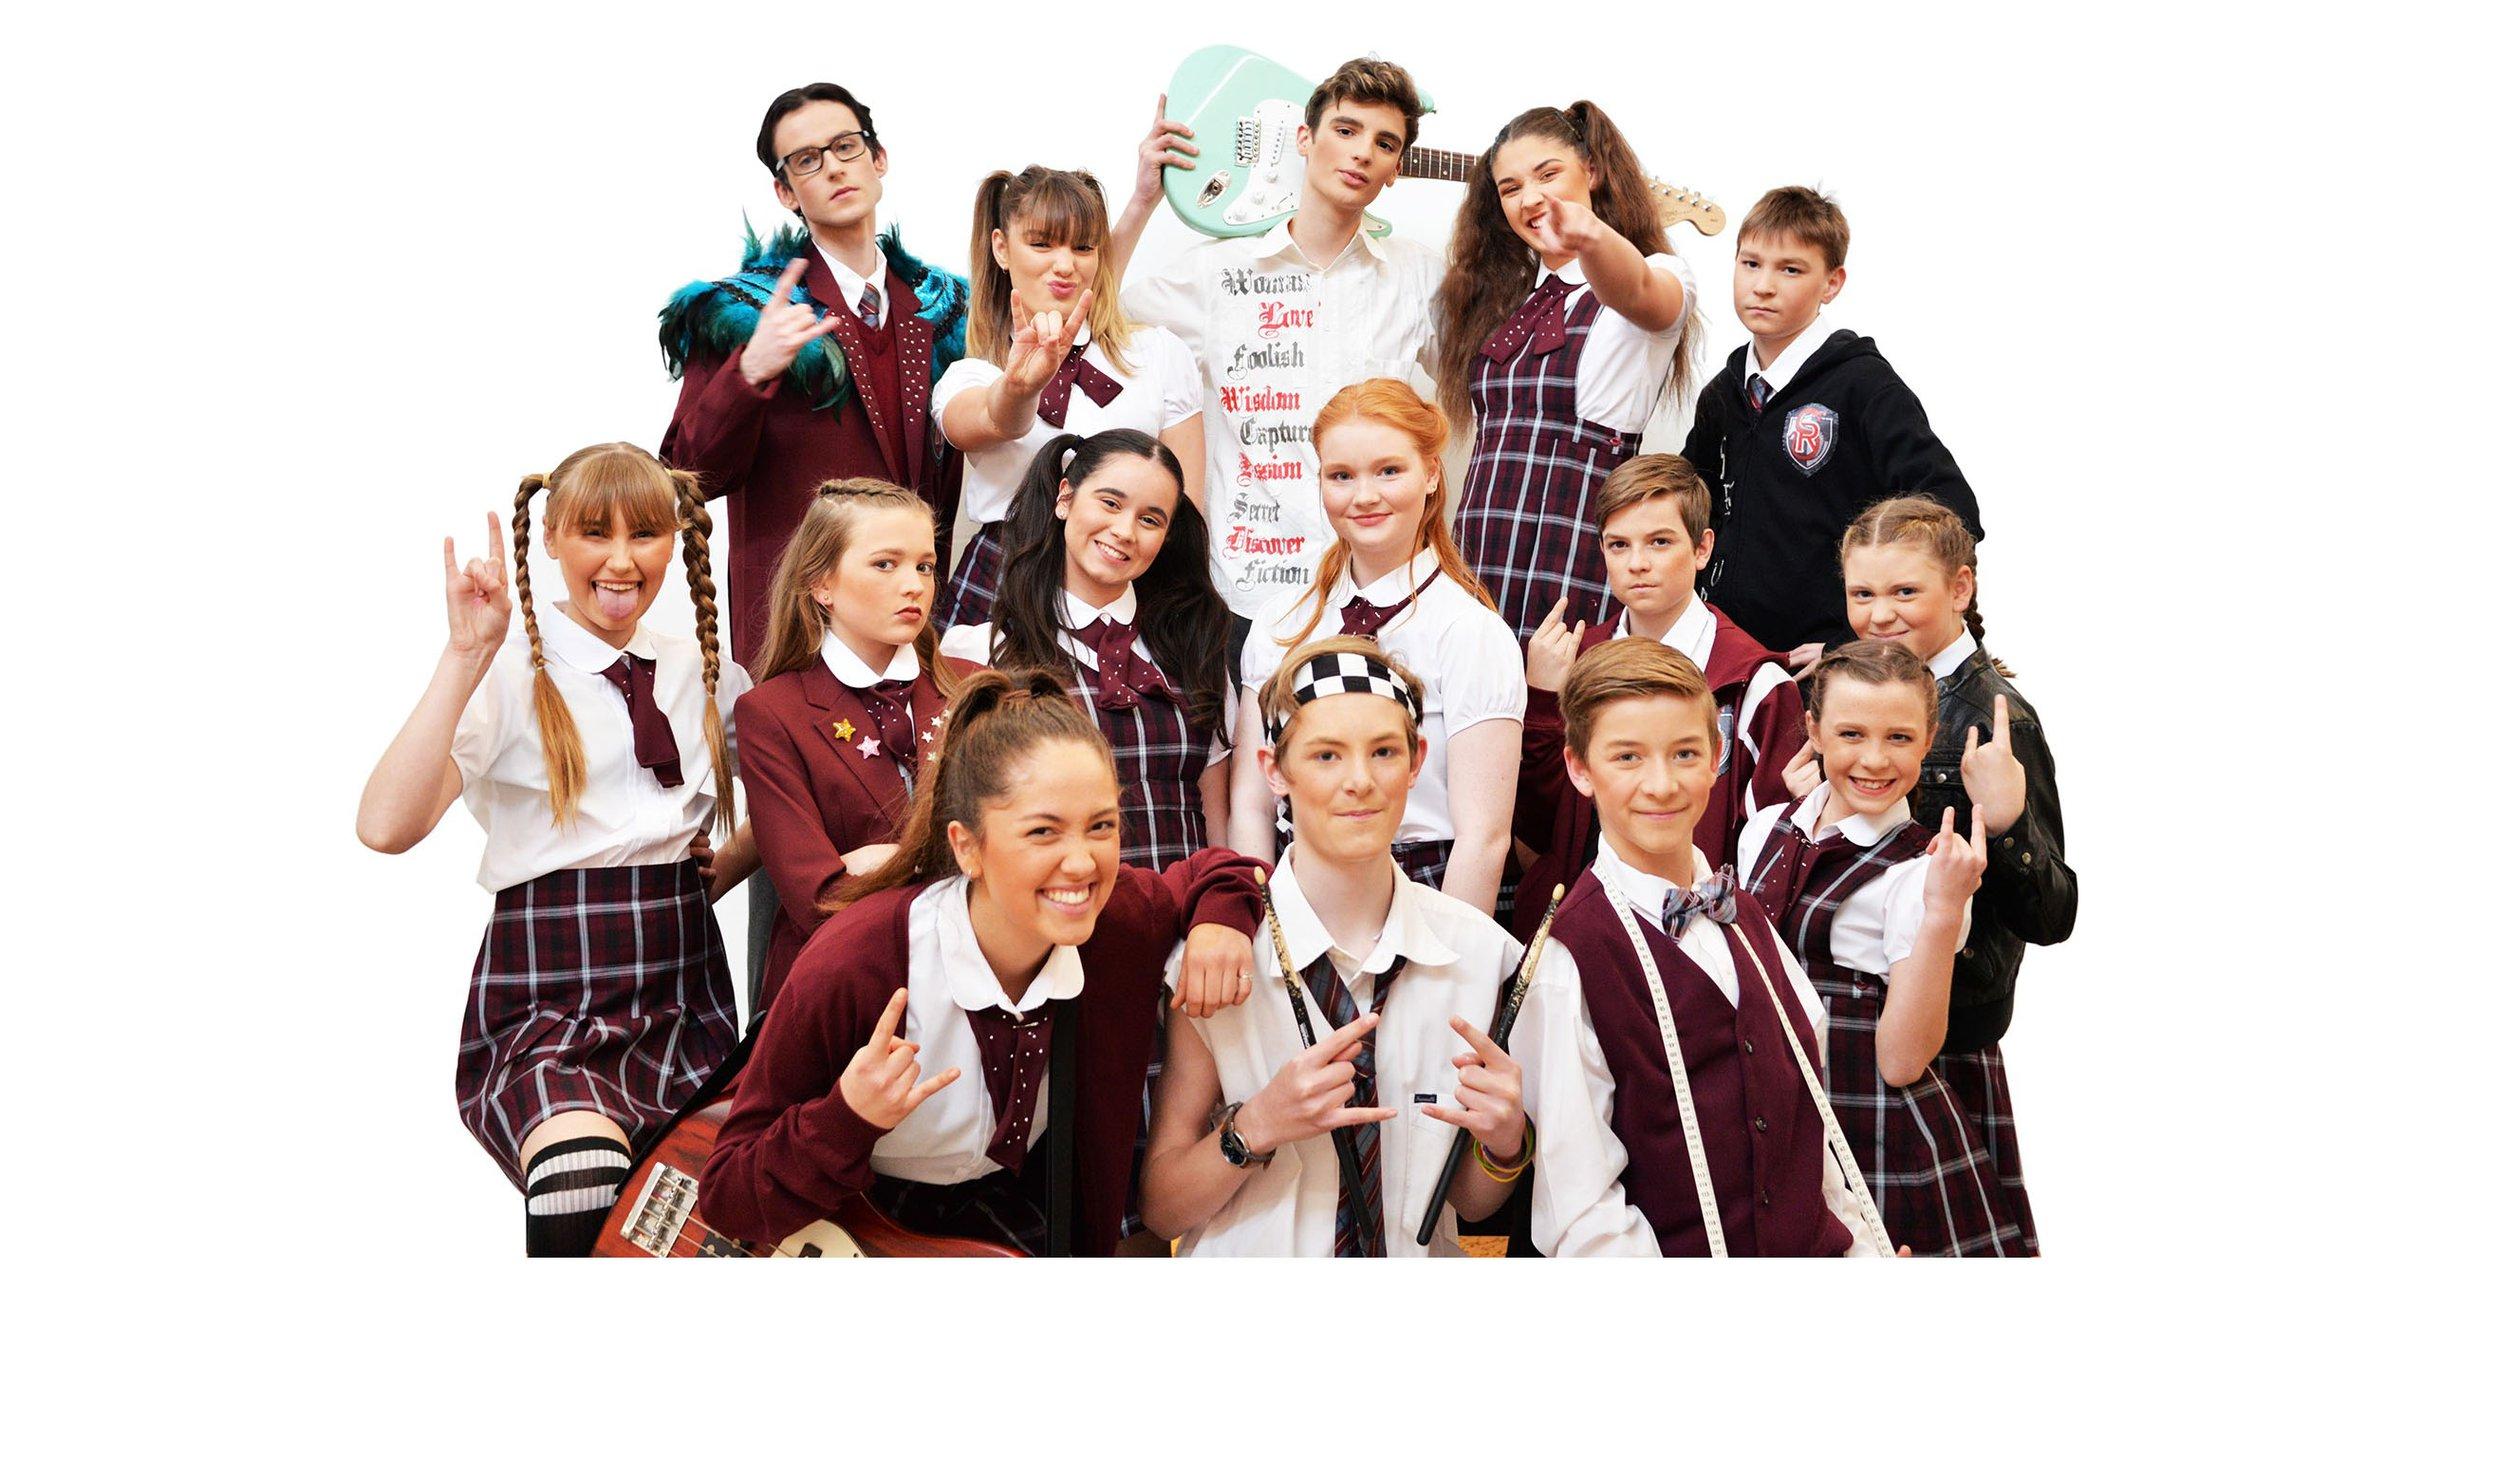 School of rock11.jpg